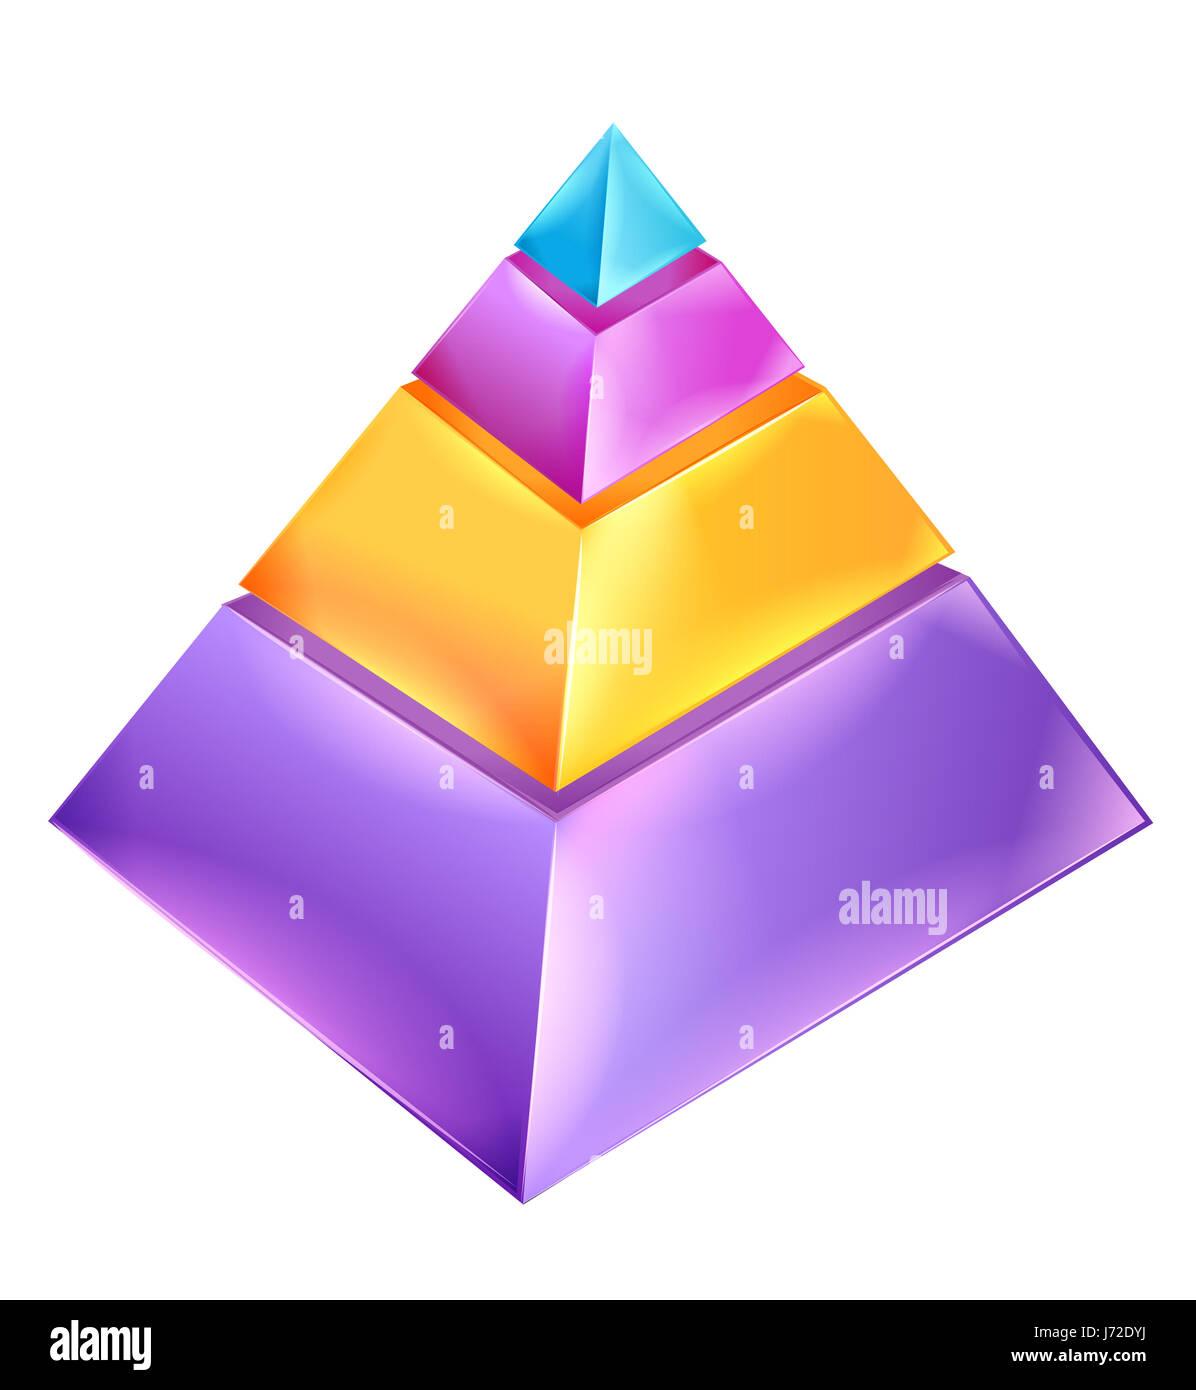 pyramid presentation graphics model design project concept plan